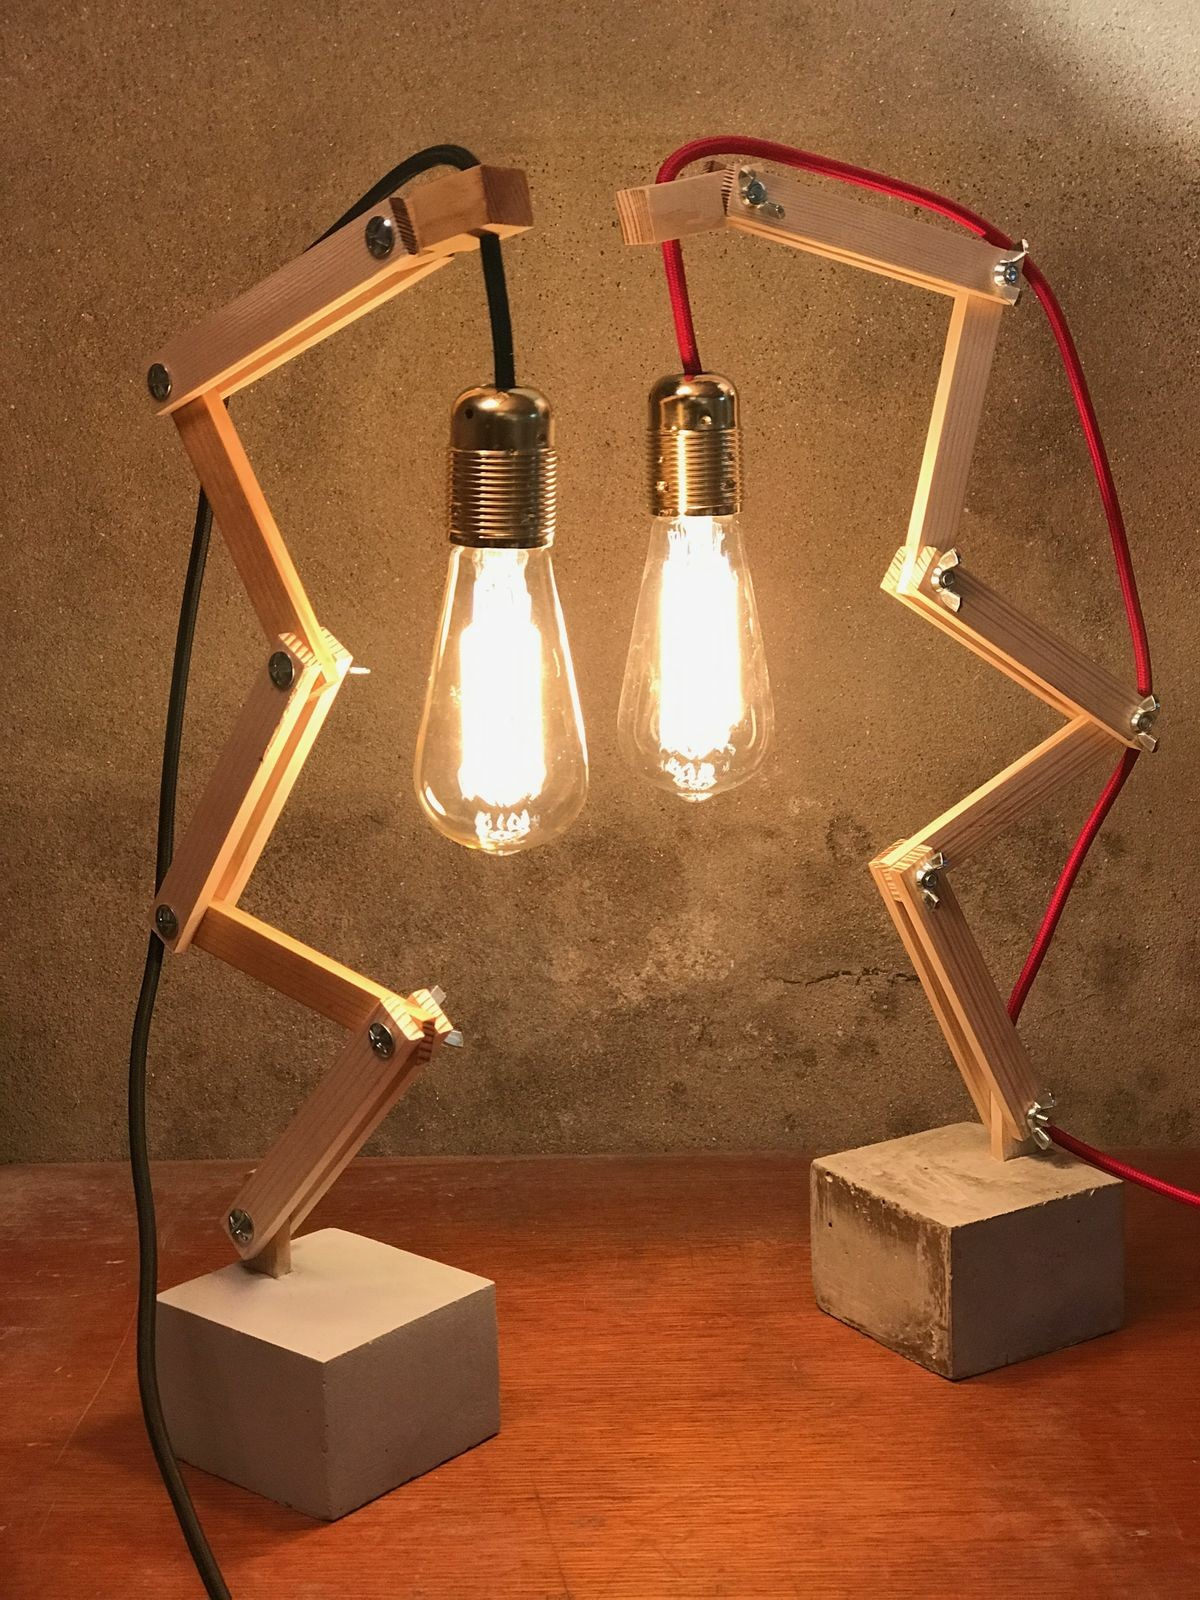 En güzel ahsap masa lambasi fikirleri www.cokiyiabi.com